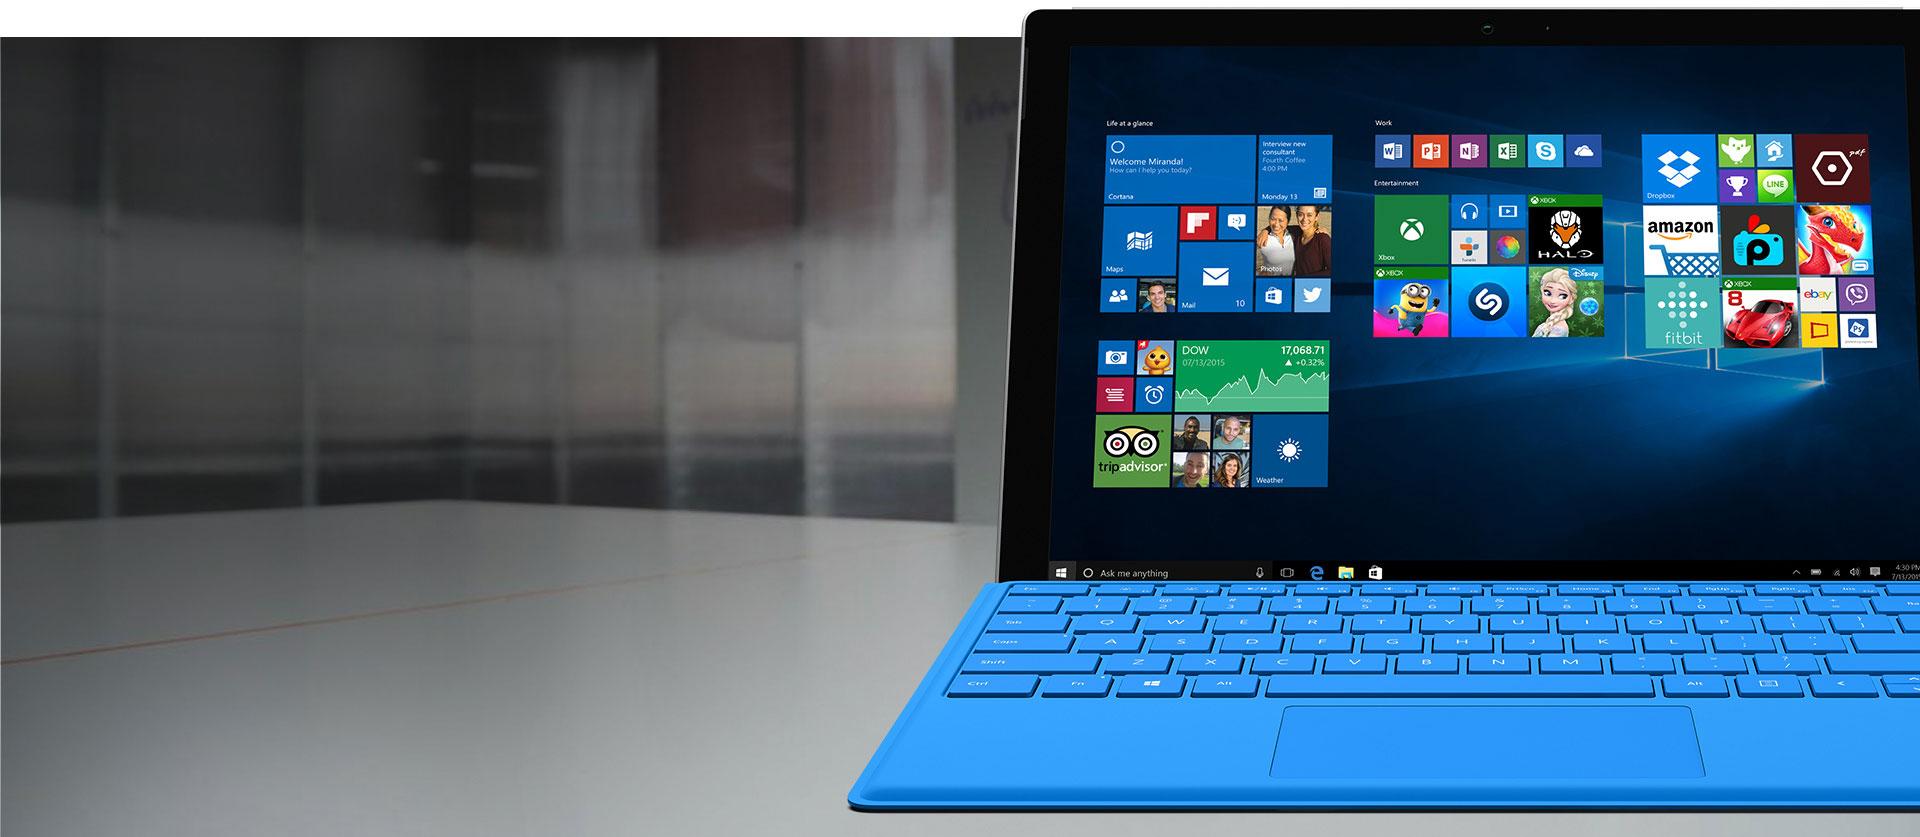 Microsoft Surface Pro 4 6th Gen Intel Core I5 4gb 128gb Windows 10 Silver Runs Office Perfectly